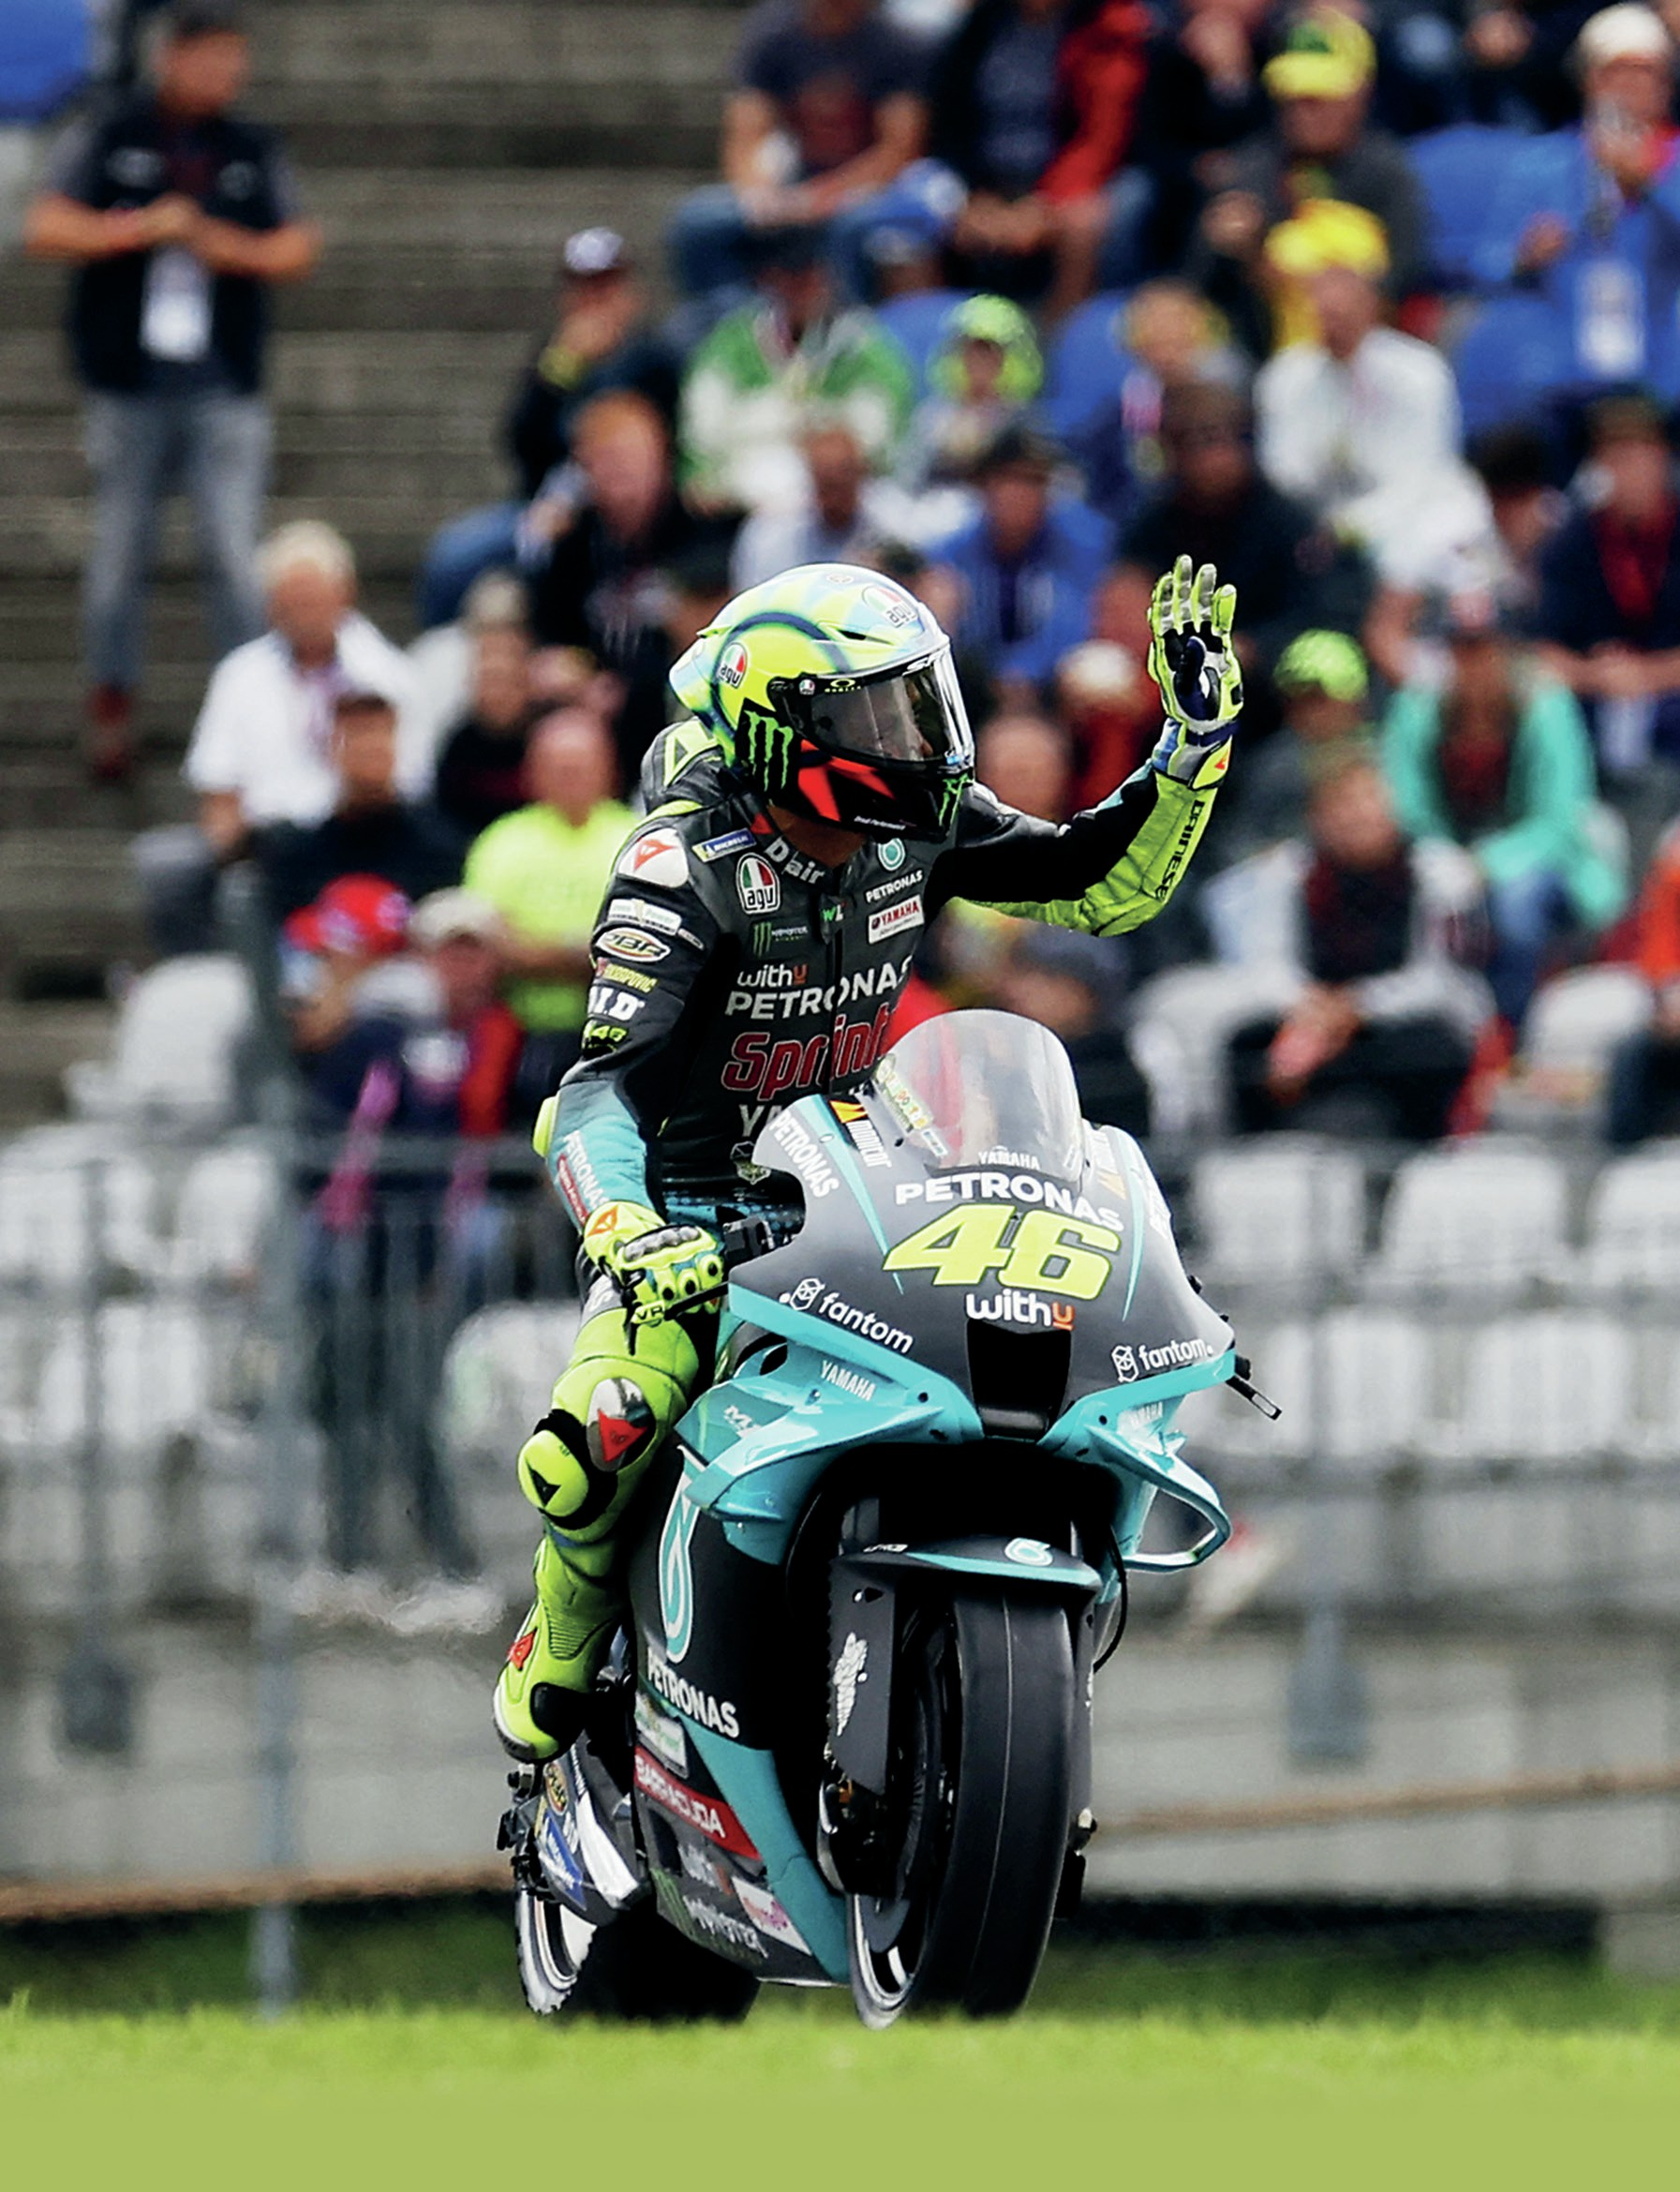 MotoGP Yamaha of Valentino Rossi